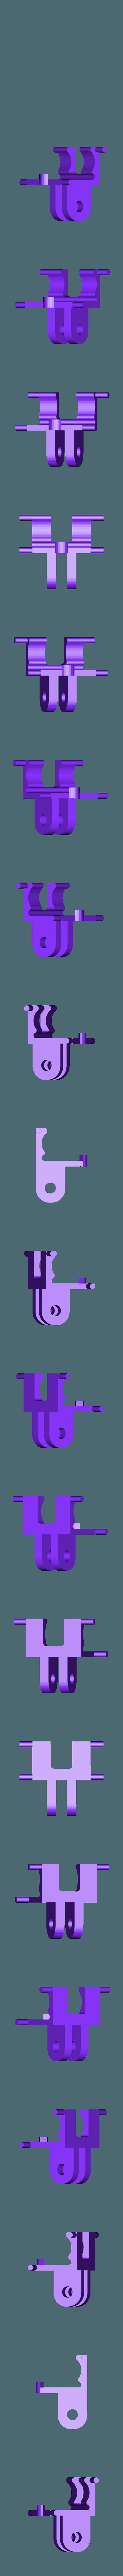 support_micrometre_fd.stl Download free STL file DE200 brackets micrometer parallelism head tray • 3D printable template, delmich